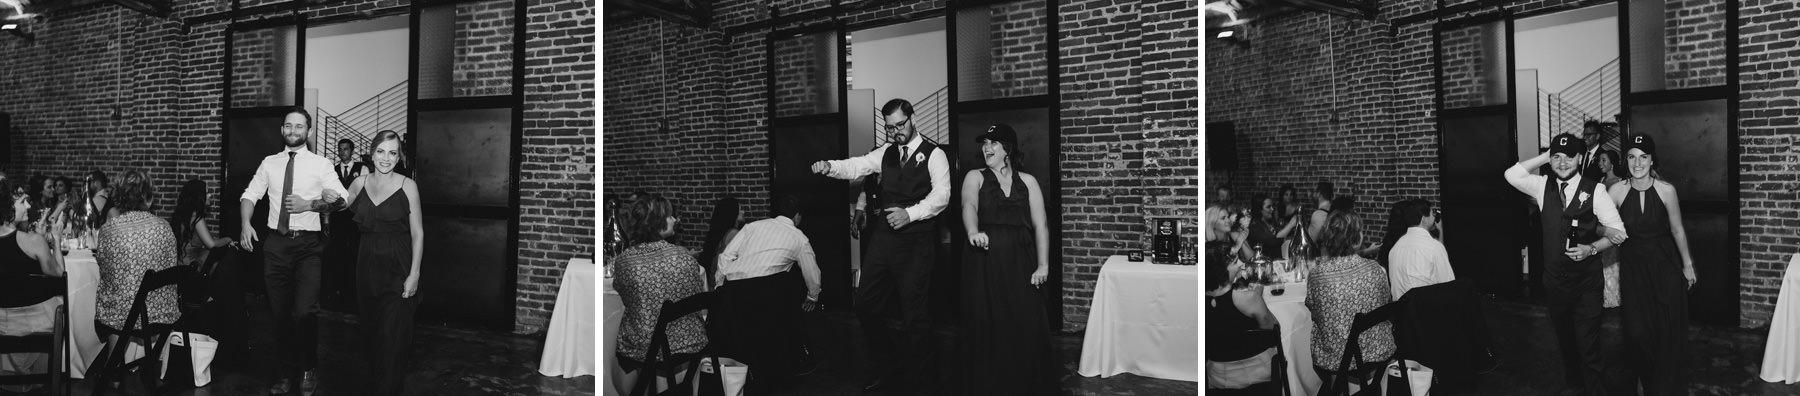 Kansas City Summer Wedding at the Guild_Kindling Wedding Photography Blog69.JPG